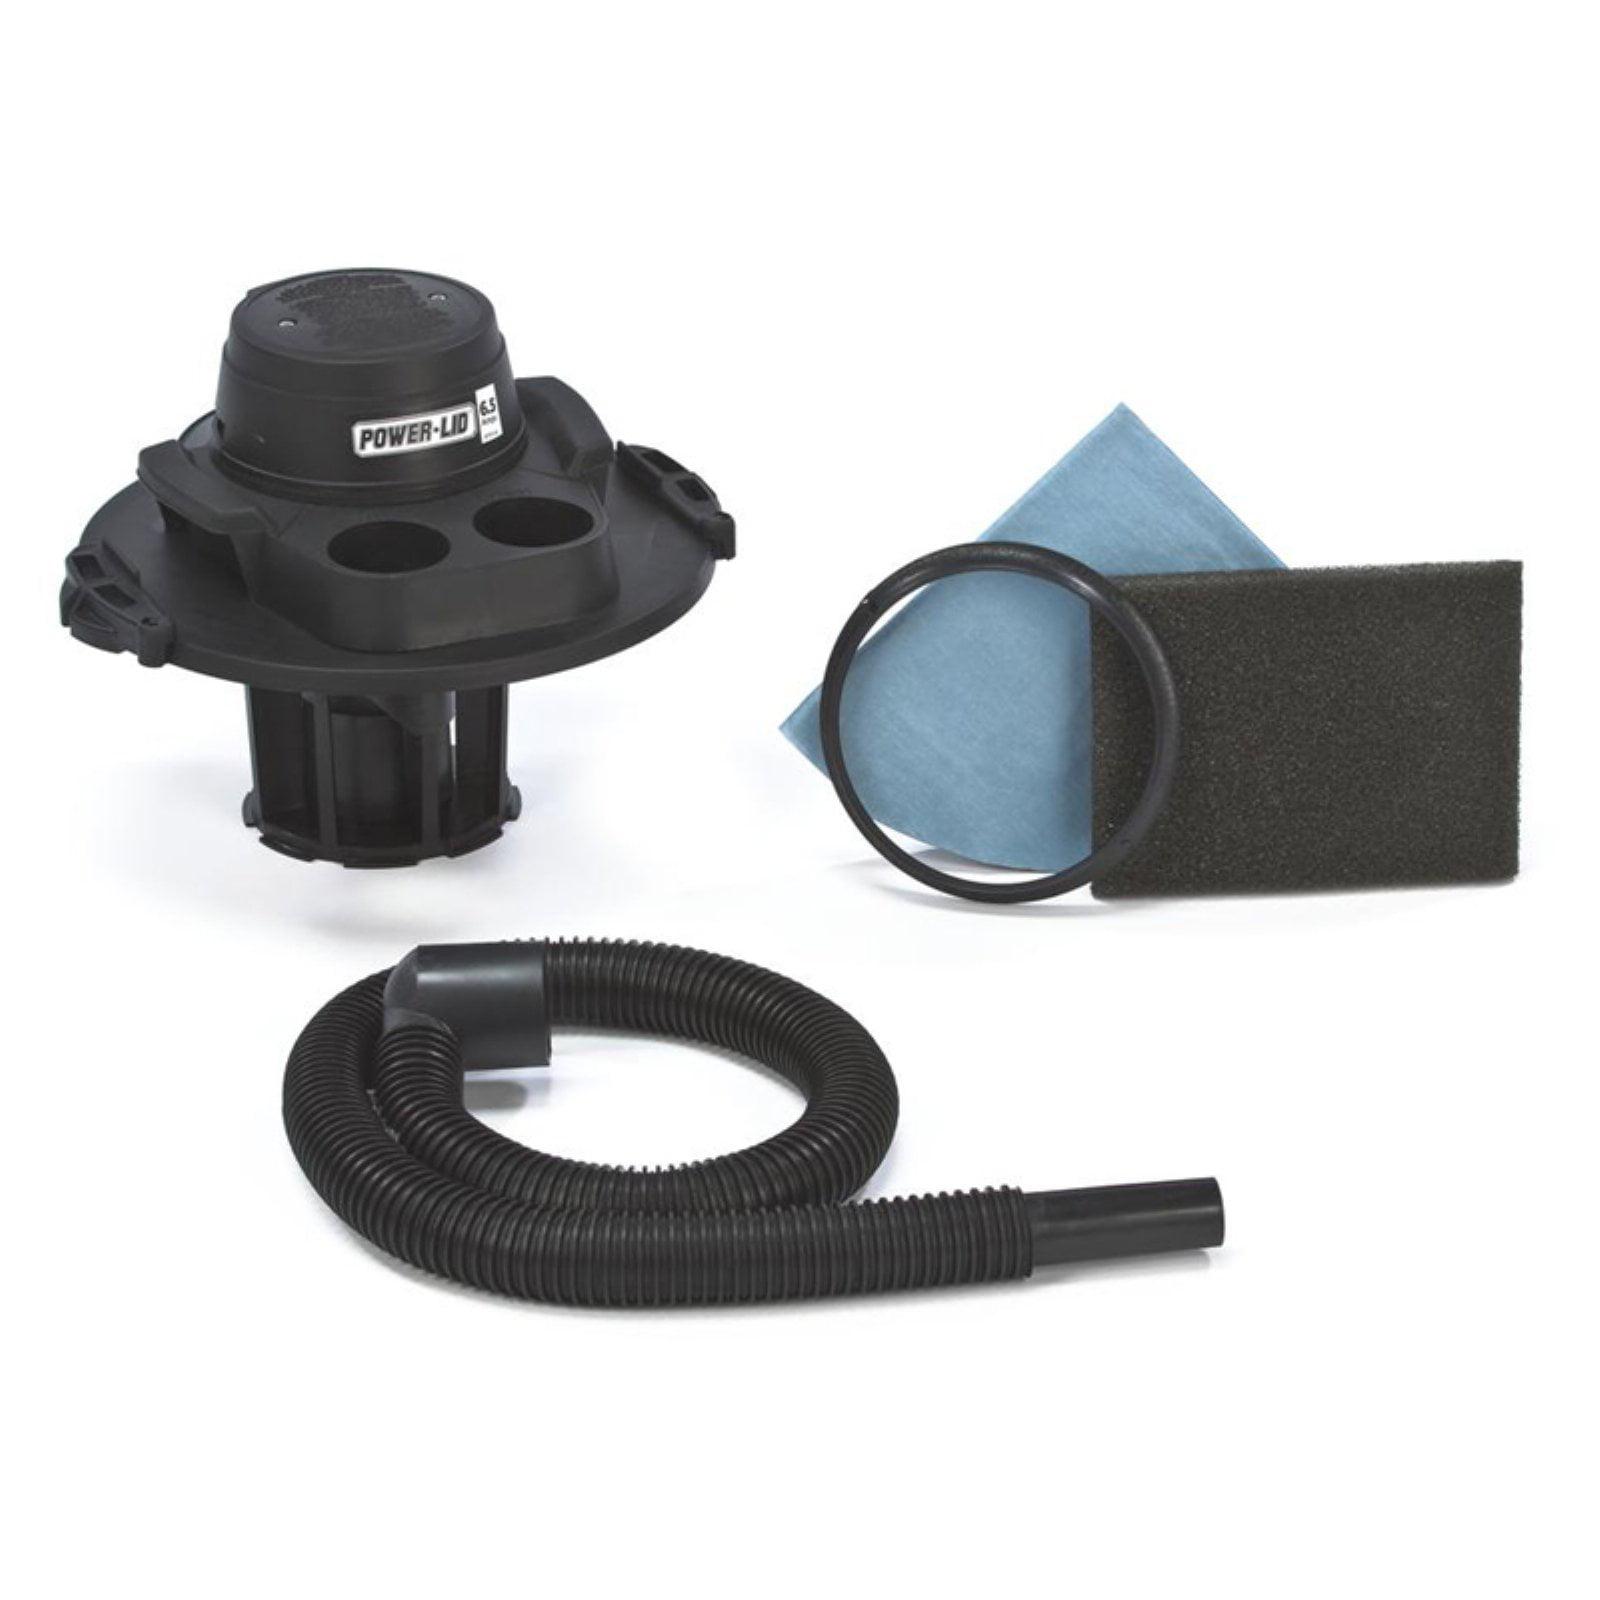 Shop Vac 6.5 Amp Wet or Dry Vacuum Head Power Lid by Shop-Vac